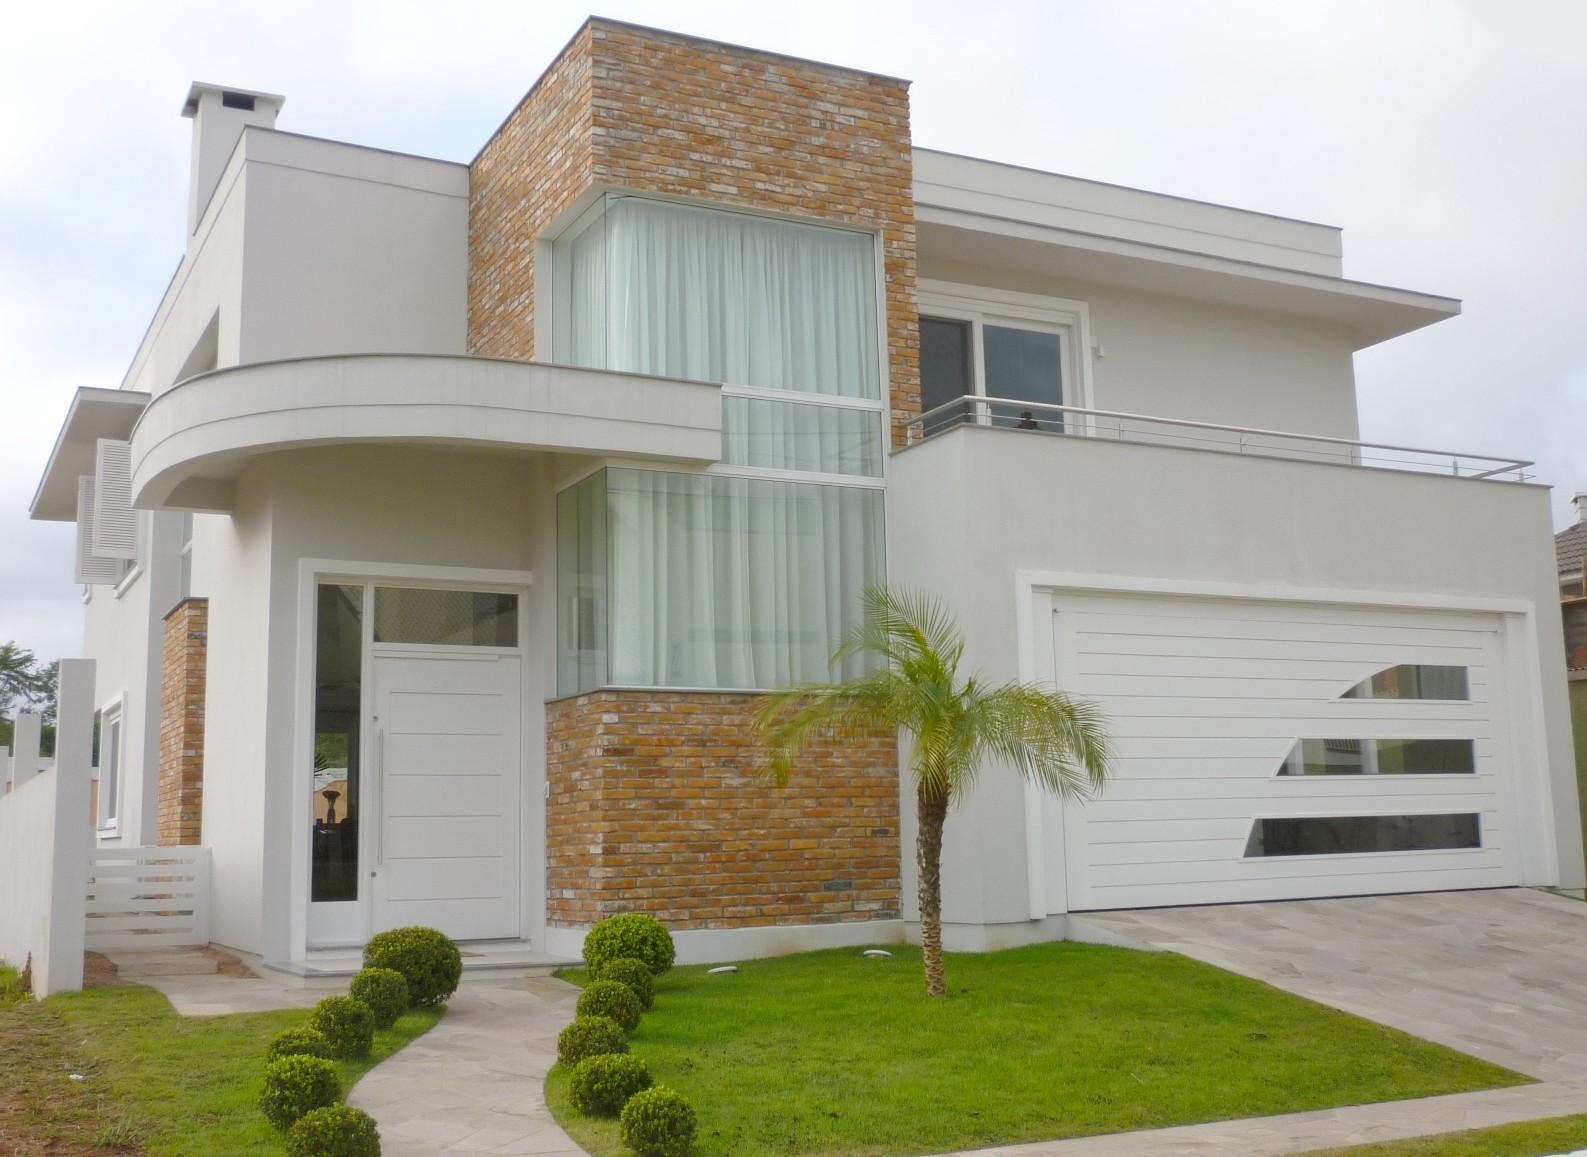 Construindo minha casa clean jardins externos fachadas - Entradas para casas ...